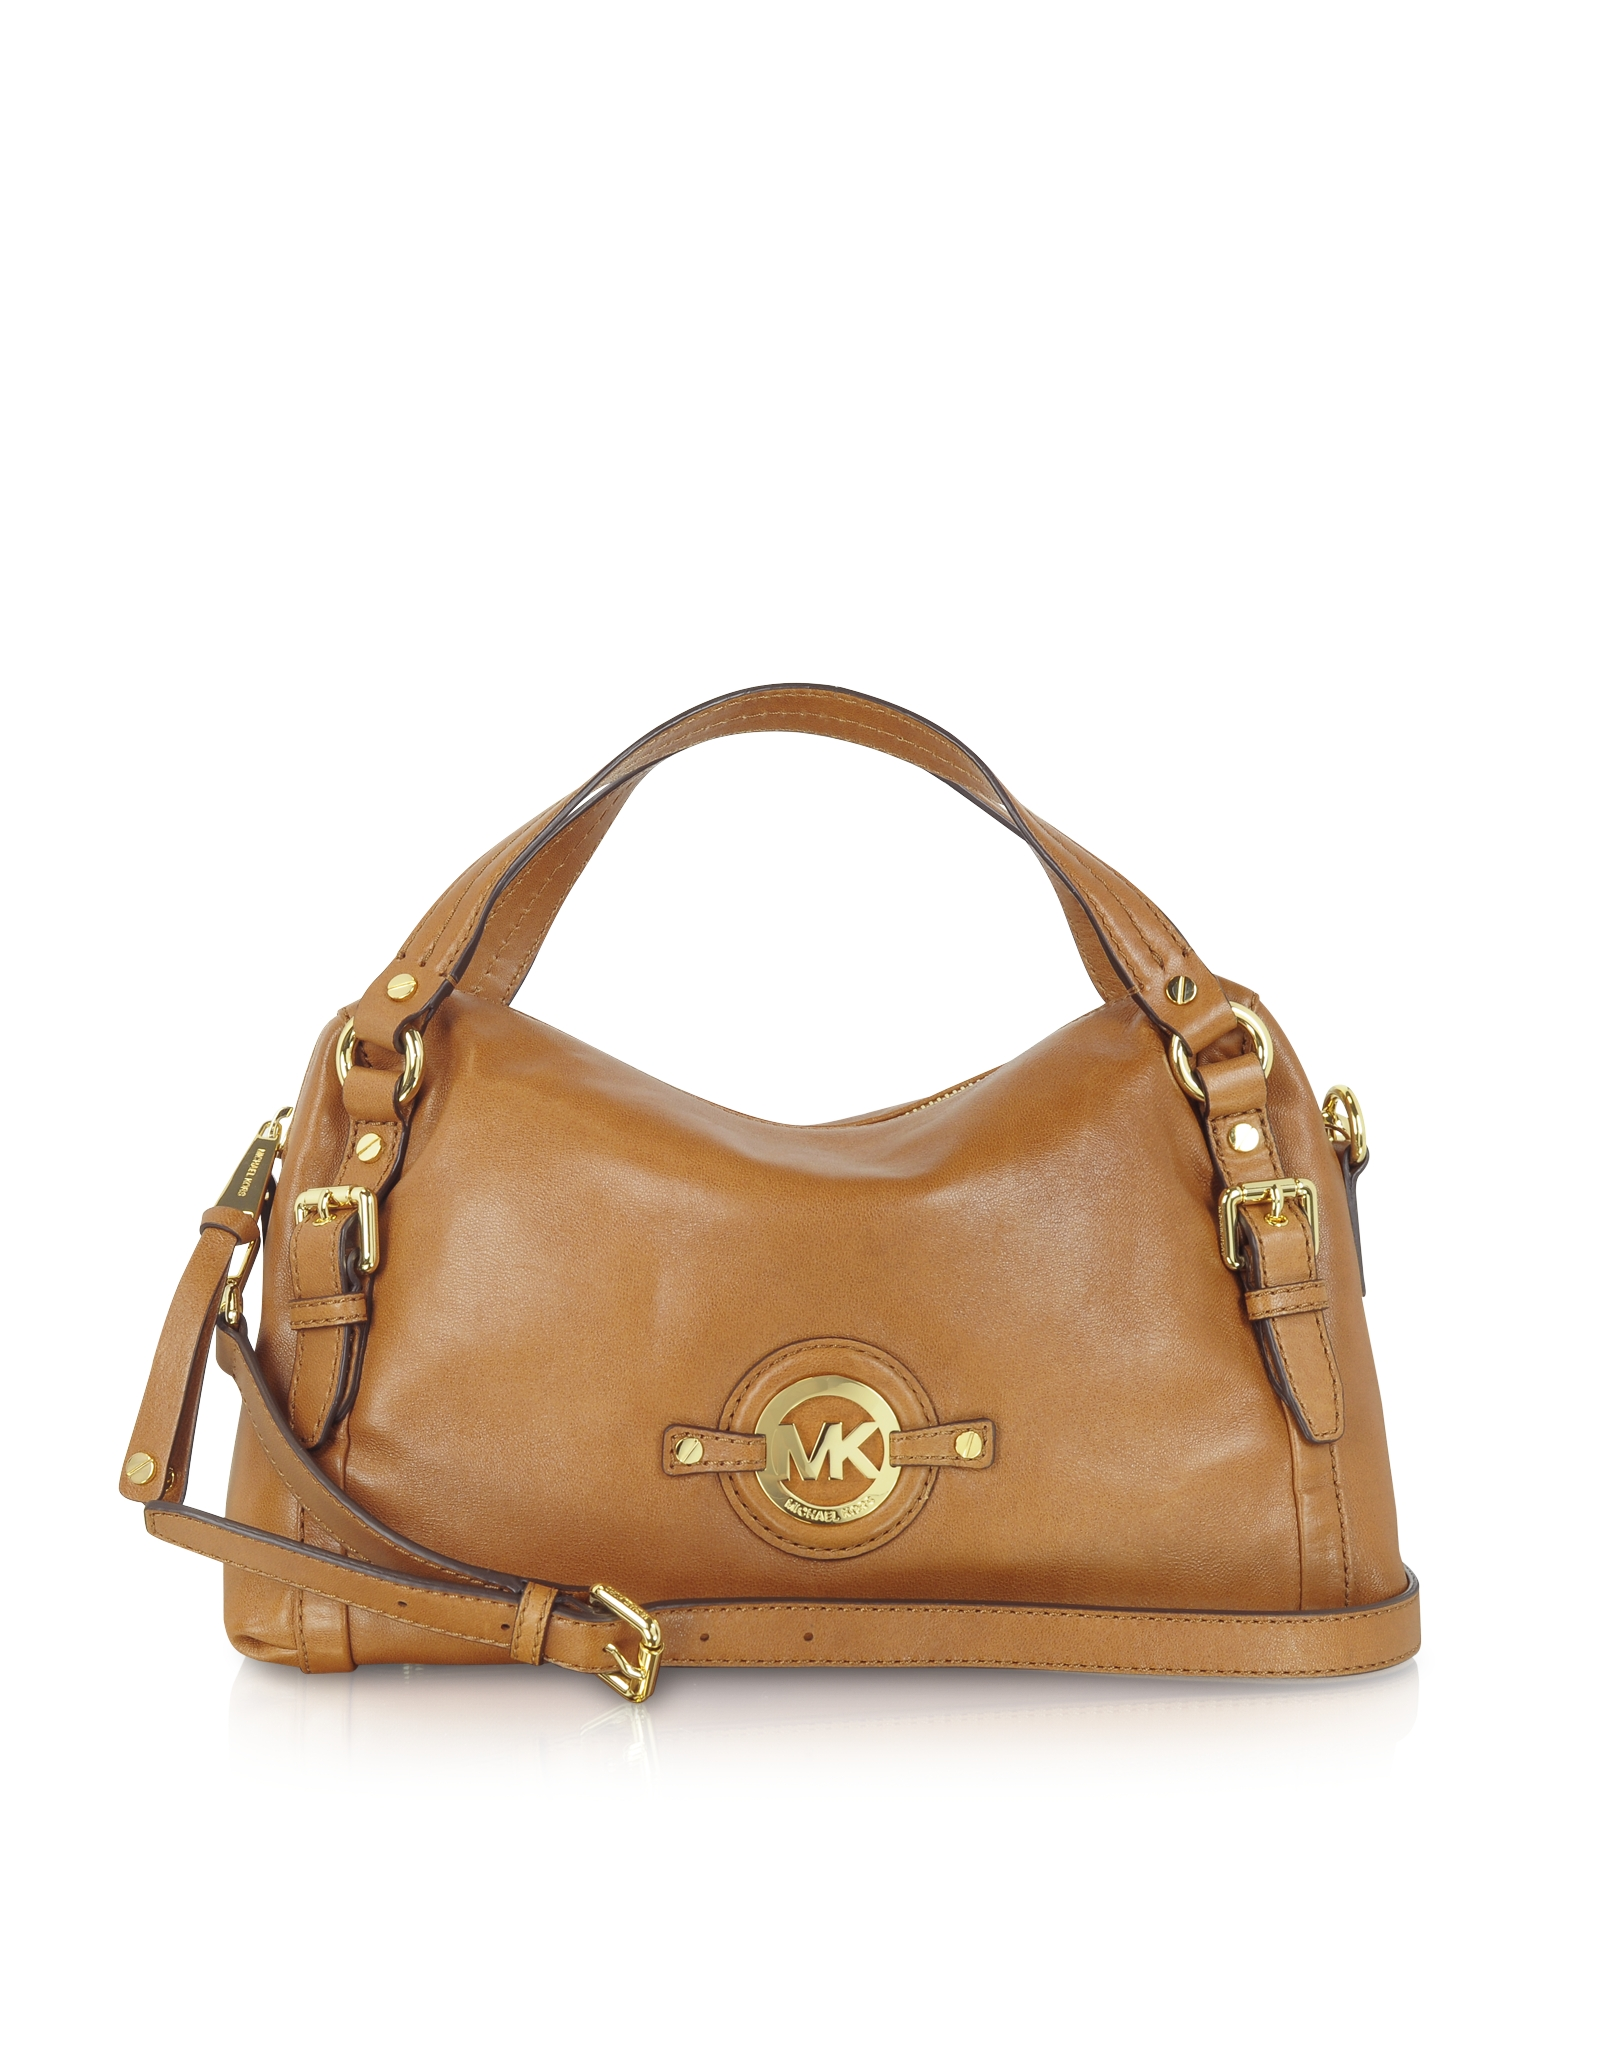 7306121bff65 ... official store lyst michael kors medium stockard shoulder satchel in  brown 6078e 364e7